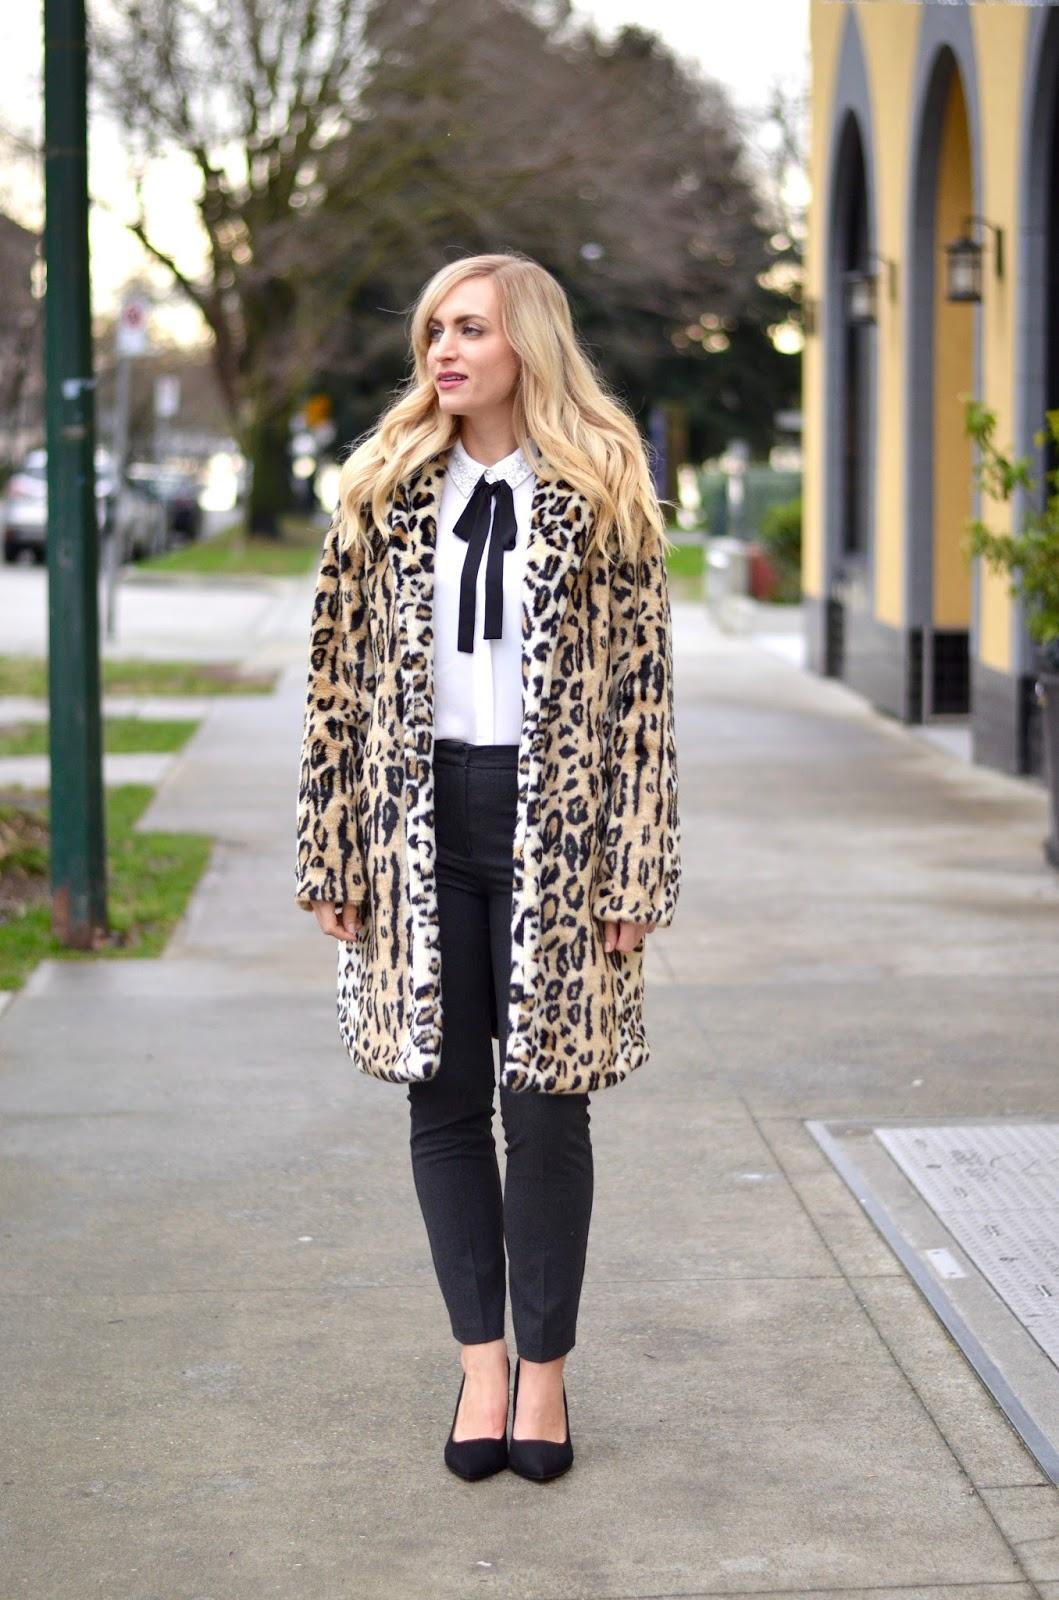 Exact Leopard Coat    Similar Leopard Coat    Similar Bow Blouse    Grey  Pants    Suede Block Heels (so comfortable!) 4a210375c574